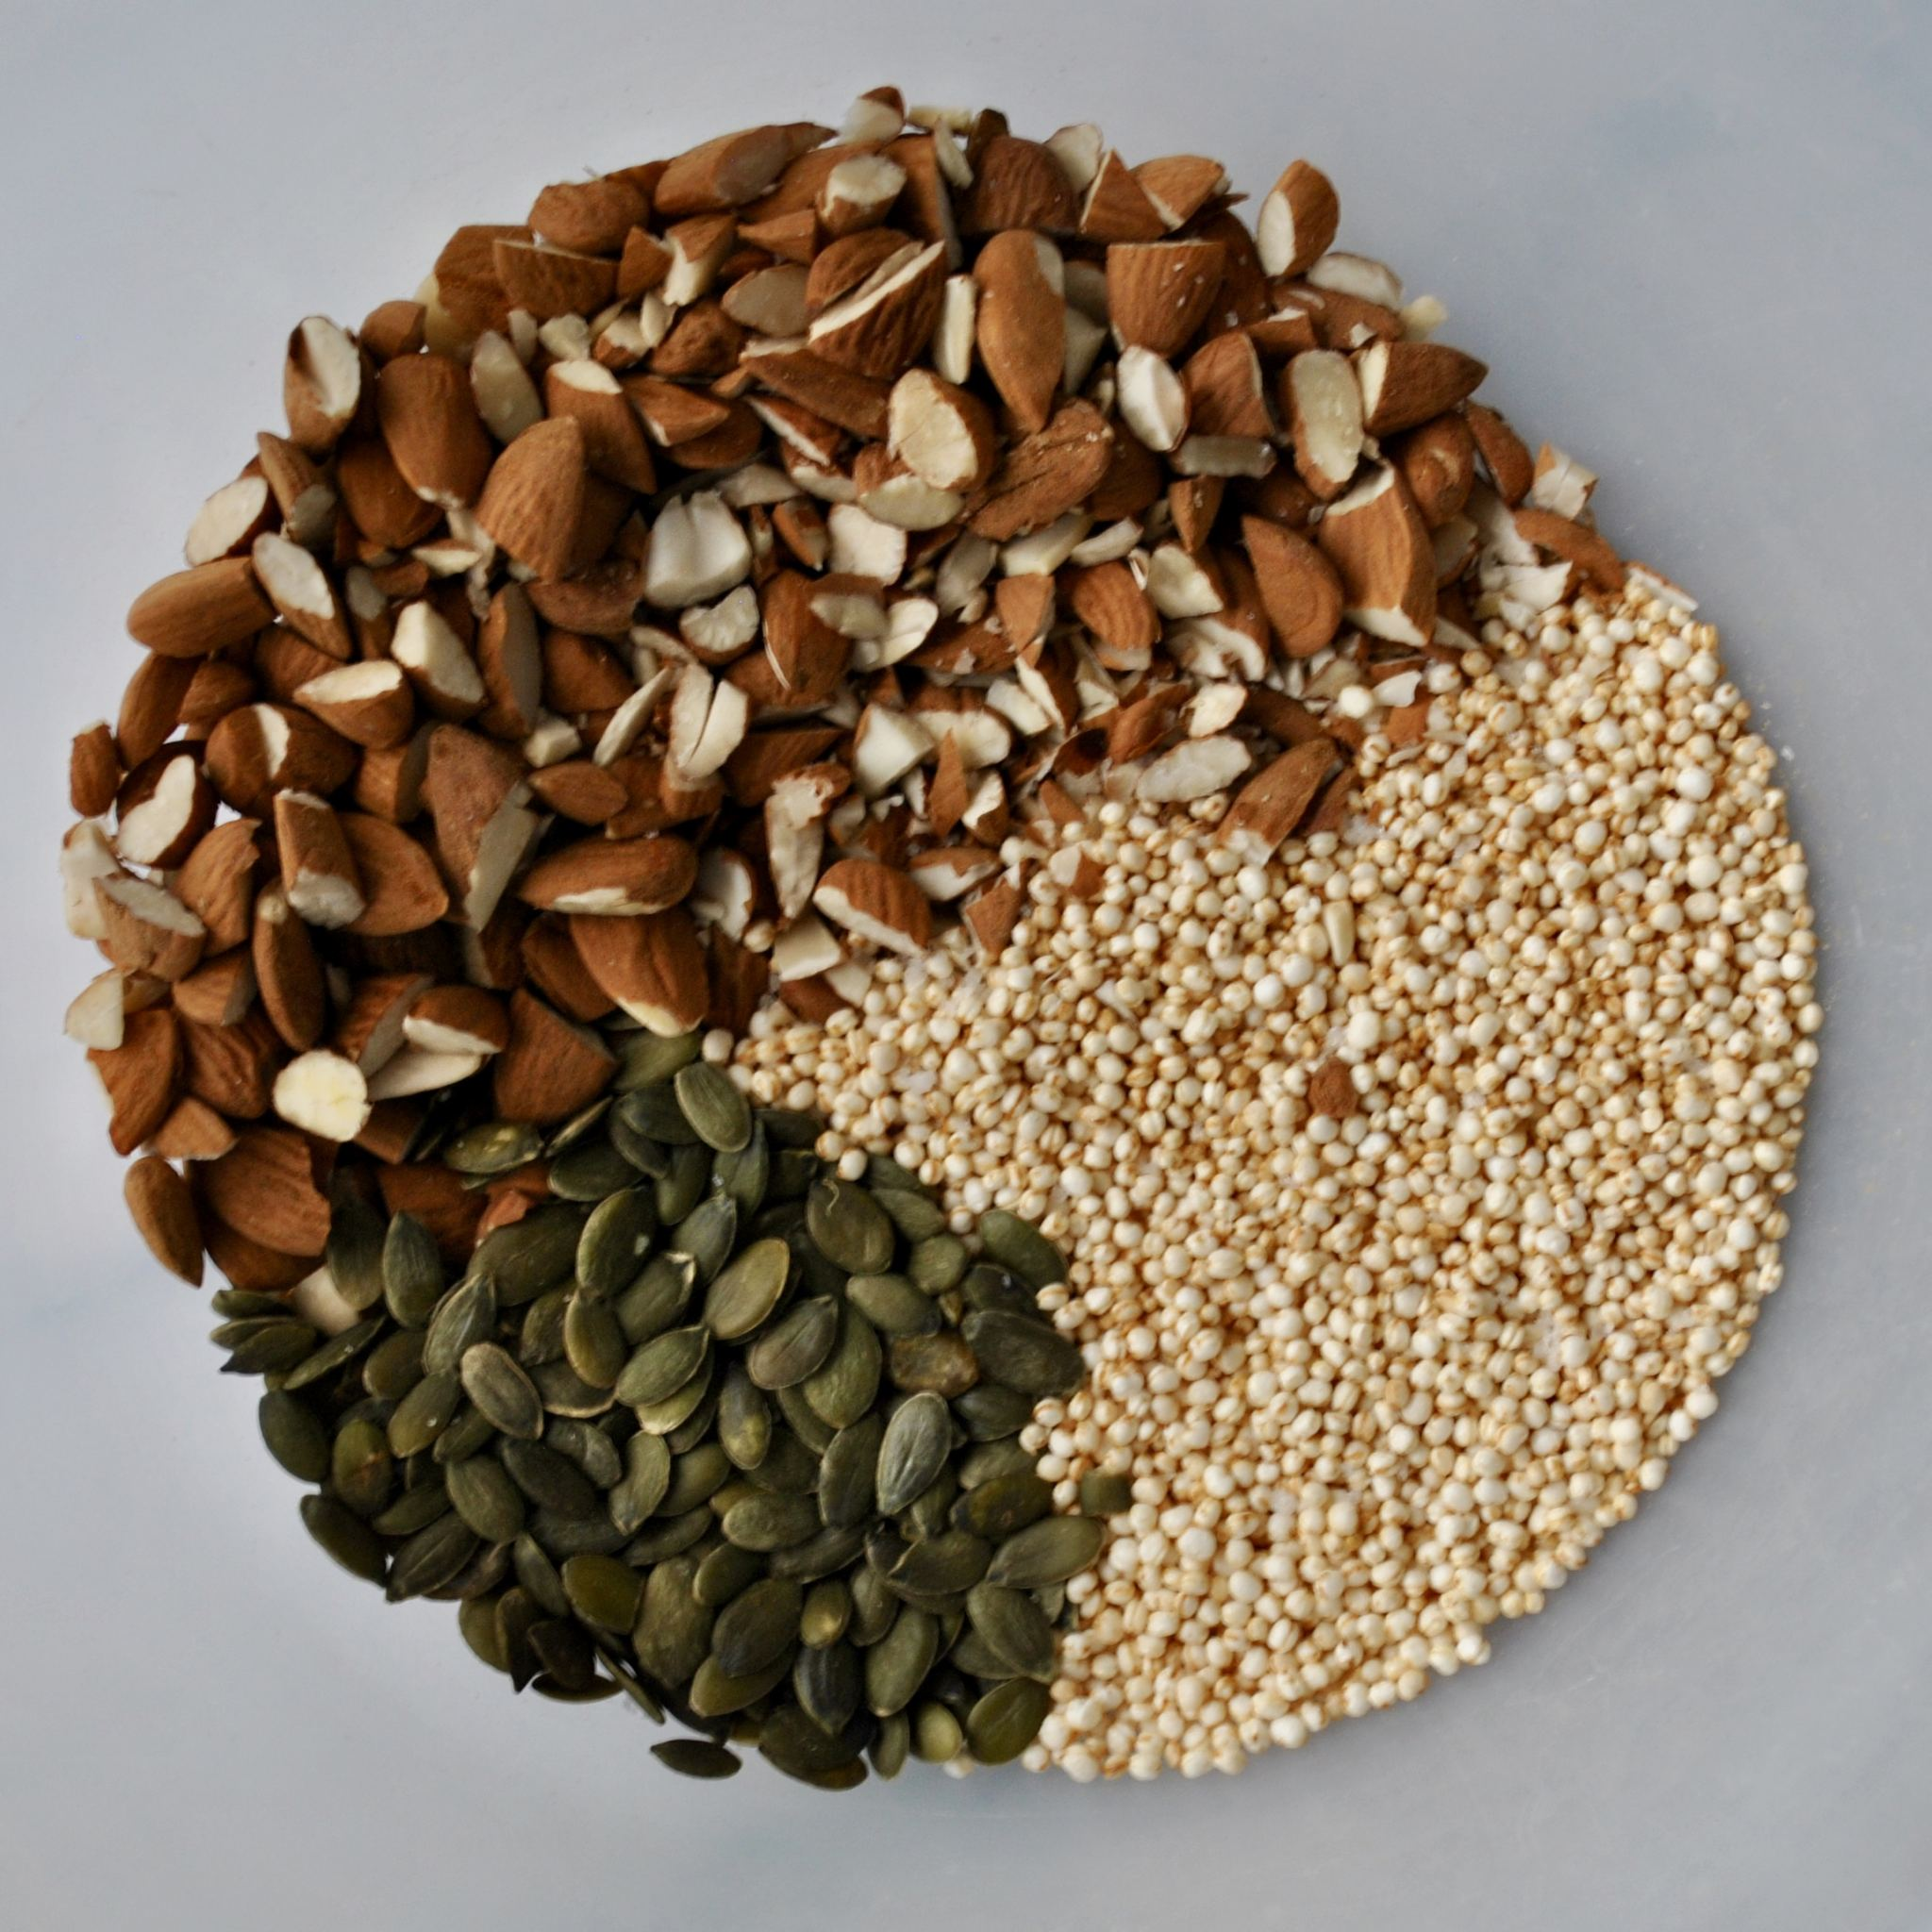 Quinoa, Almond & Pumpkin Seed Brittle (Vegan, Gluten Free)